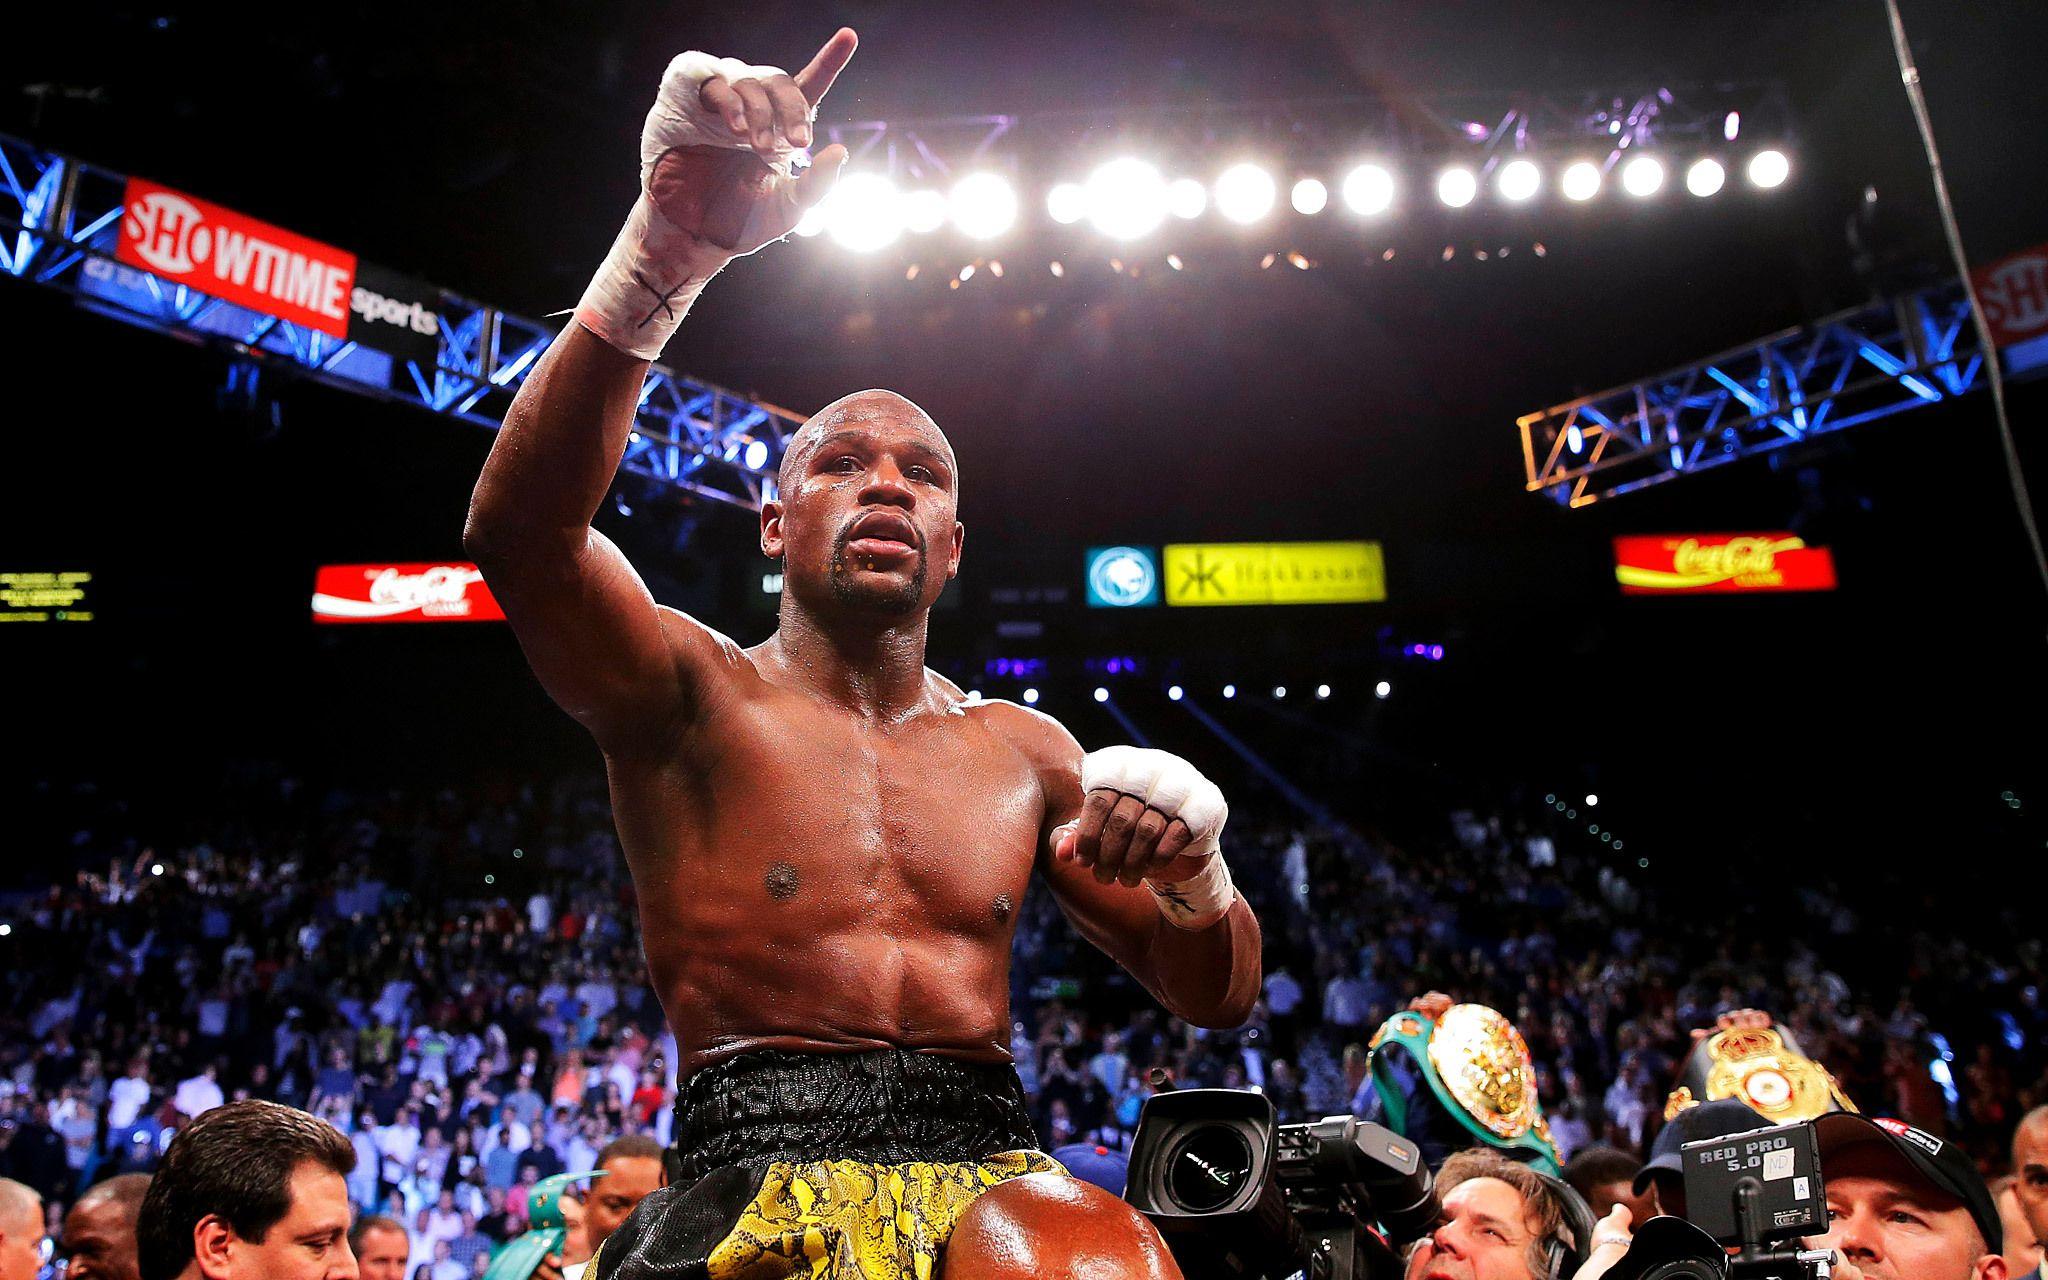 Floyd Mayweather Wallpaper 1080p 2 Floydmayweatherwallpaper1080p Floydmayweather Boxing Sports Wallpap Floyd Mayweather Boxing History Professional Boxer